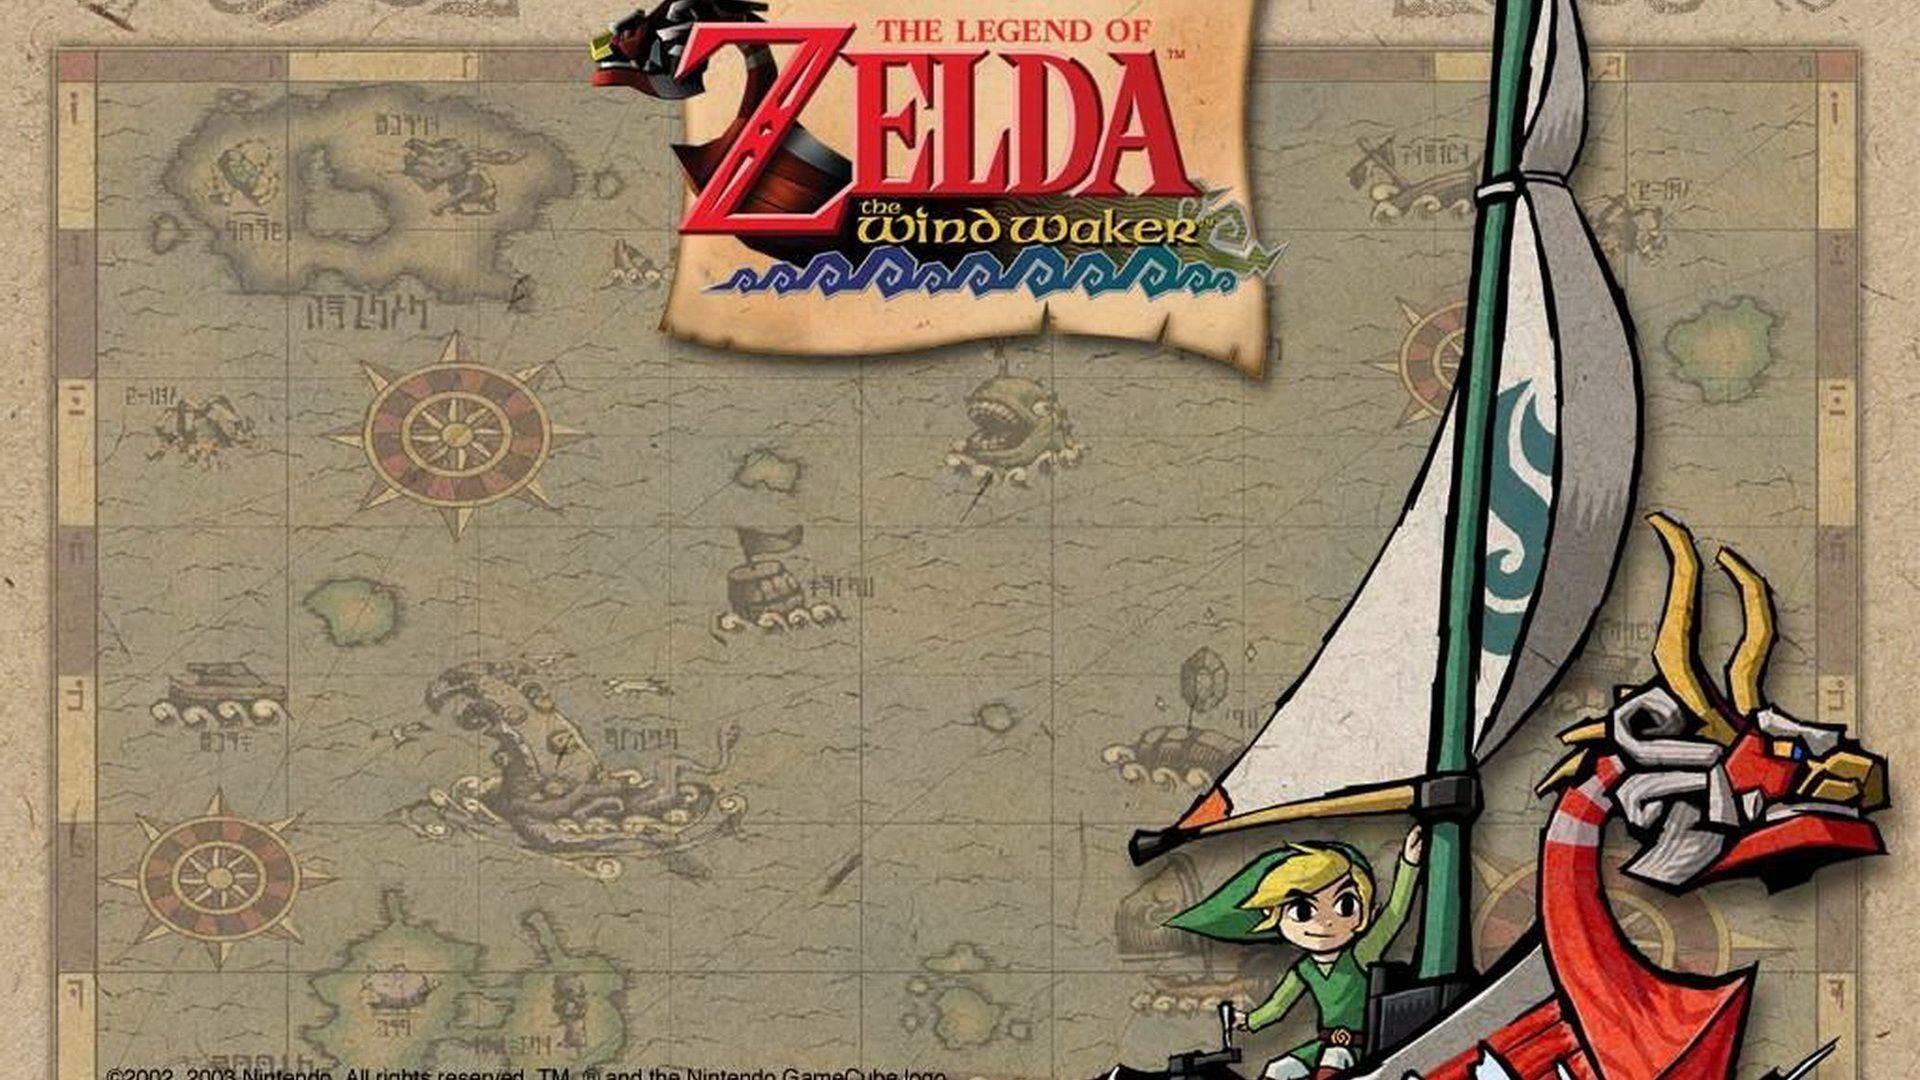 The Legend of Zelda Wind Waker HD Wii U Wallpapers Â« GamingBolt.com .